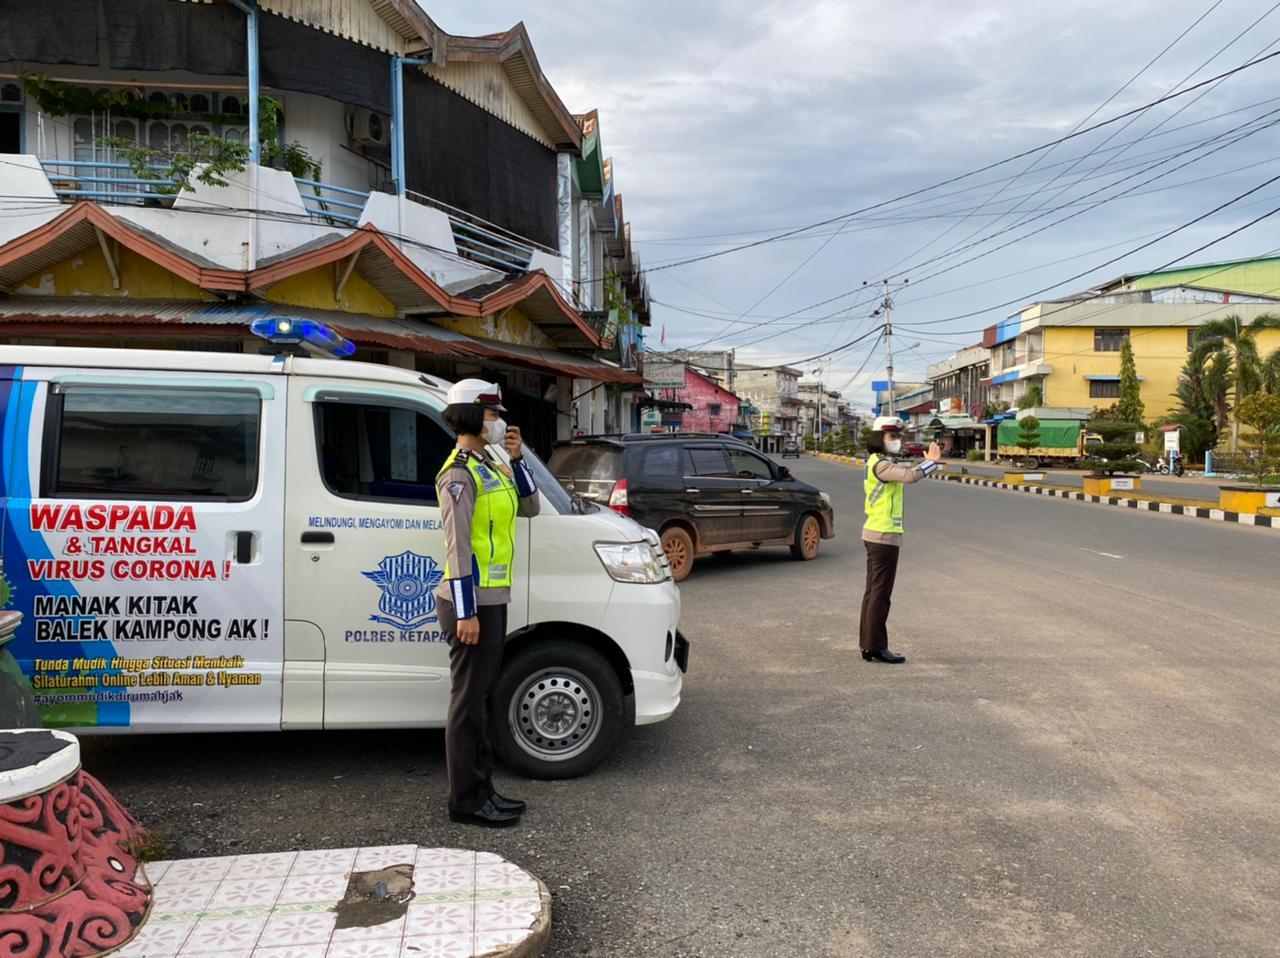 Penerangan Keliling polwan Satlantas Ketapang Berikan Informasi Tertib Berlalu Lintas